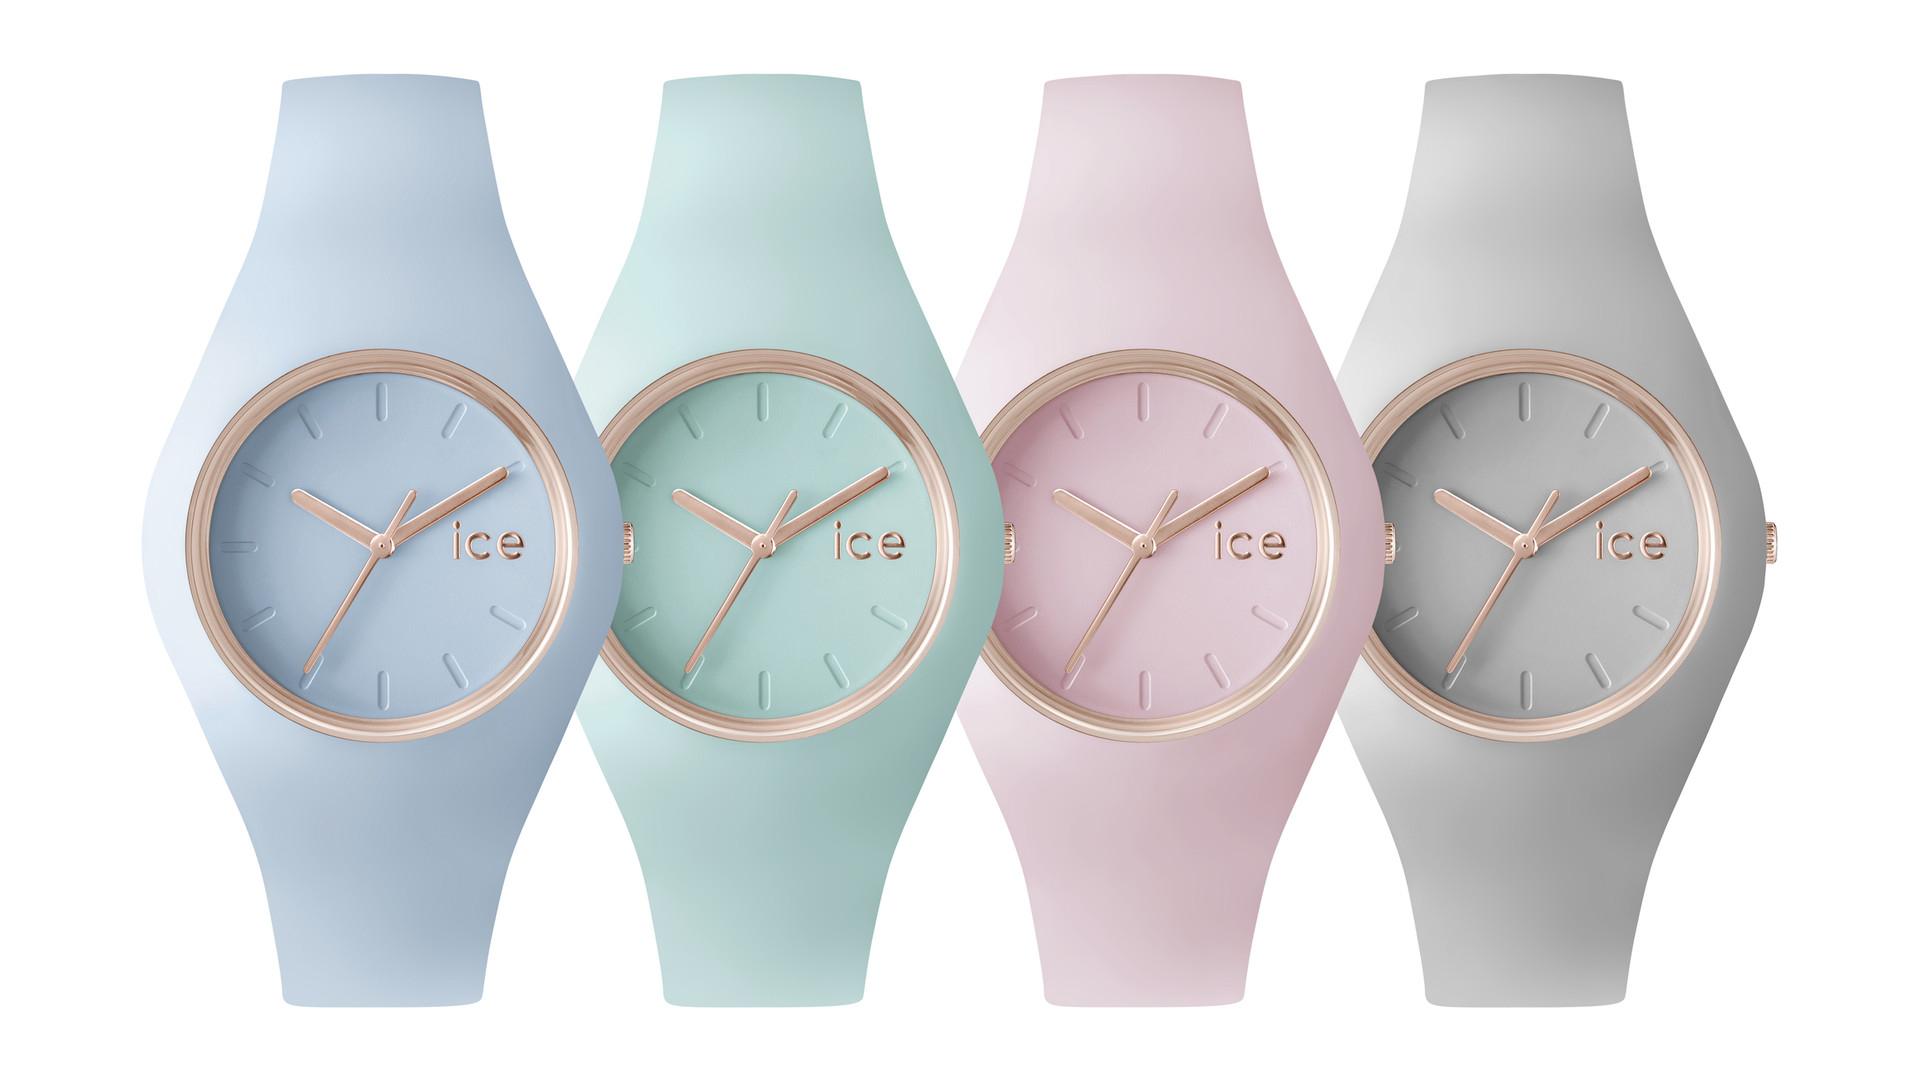 ice watch glam pastel sjd jewelry. Black Bedroom Furniture Sets. Home Design Ideas